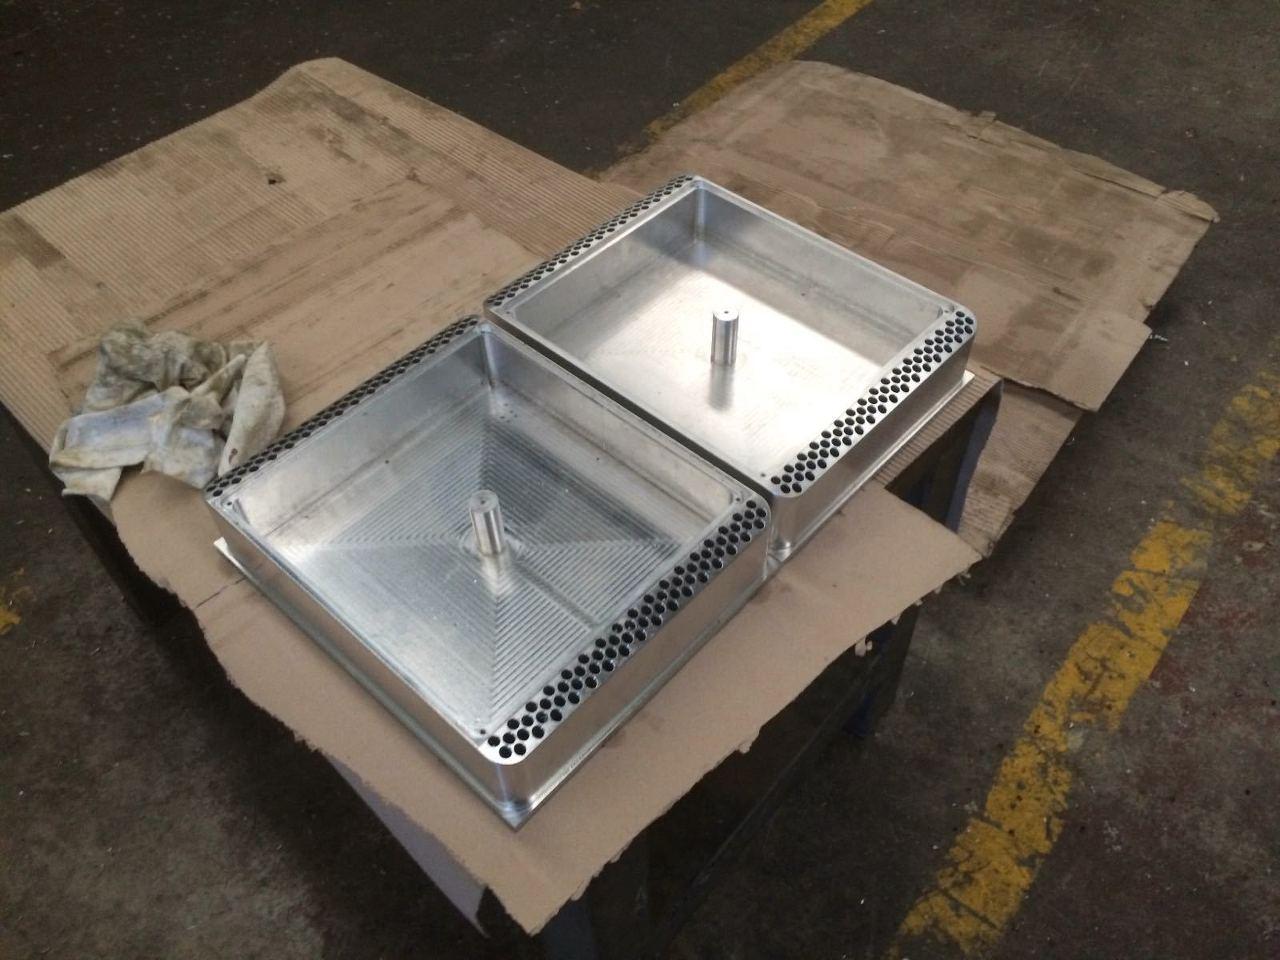 Acoustic technology mfg. Fabricación de equipos a medida. Valencia - Página 6 FJEnOi